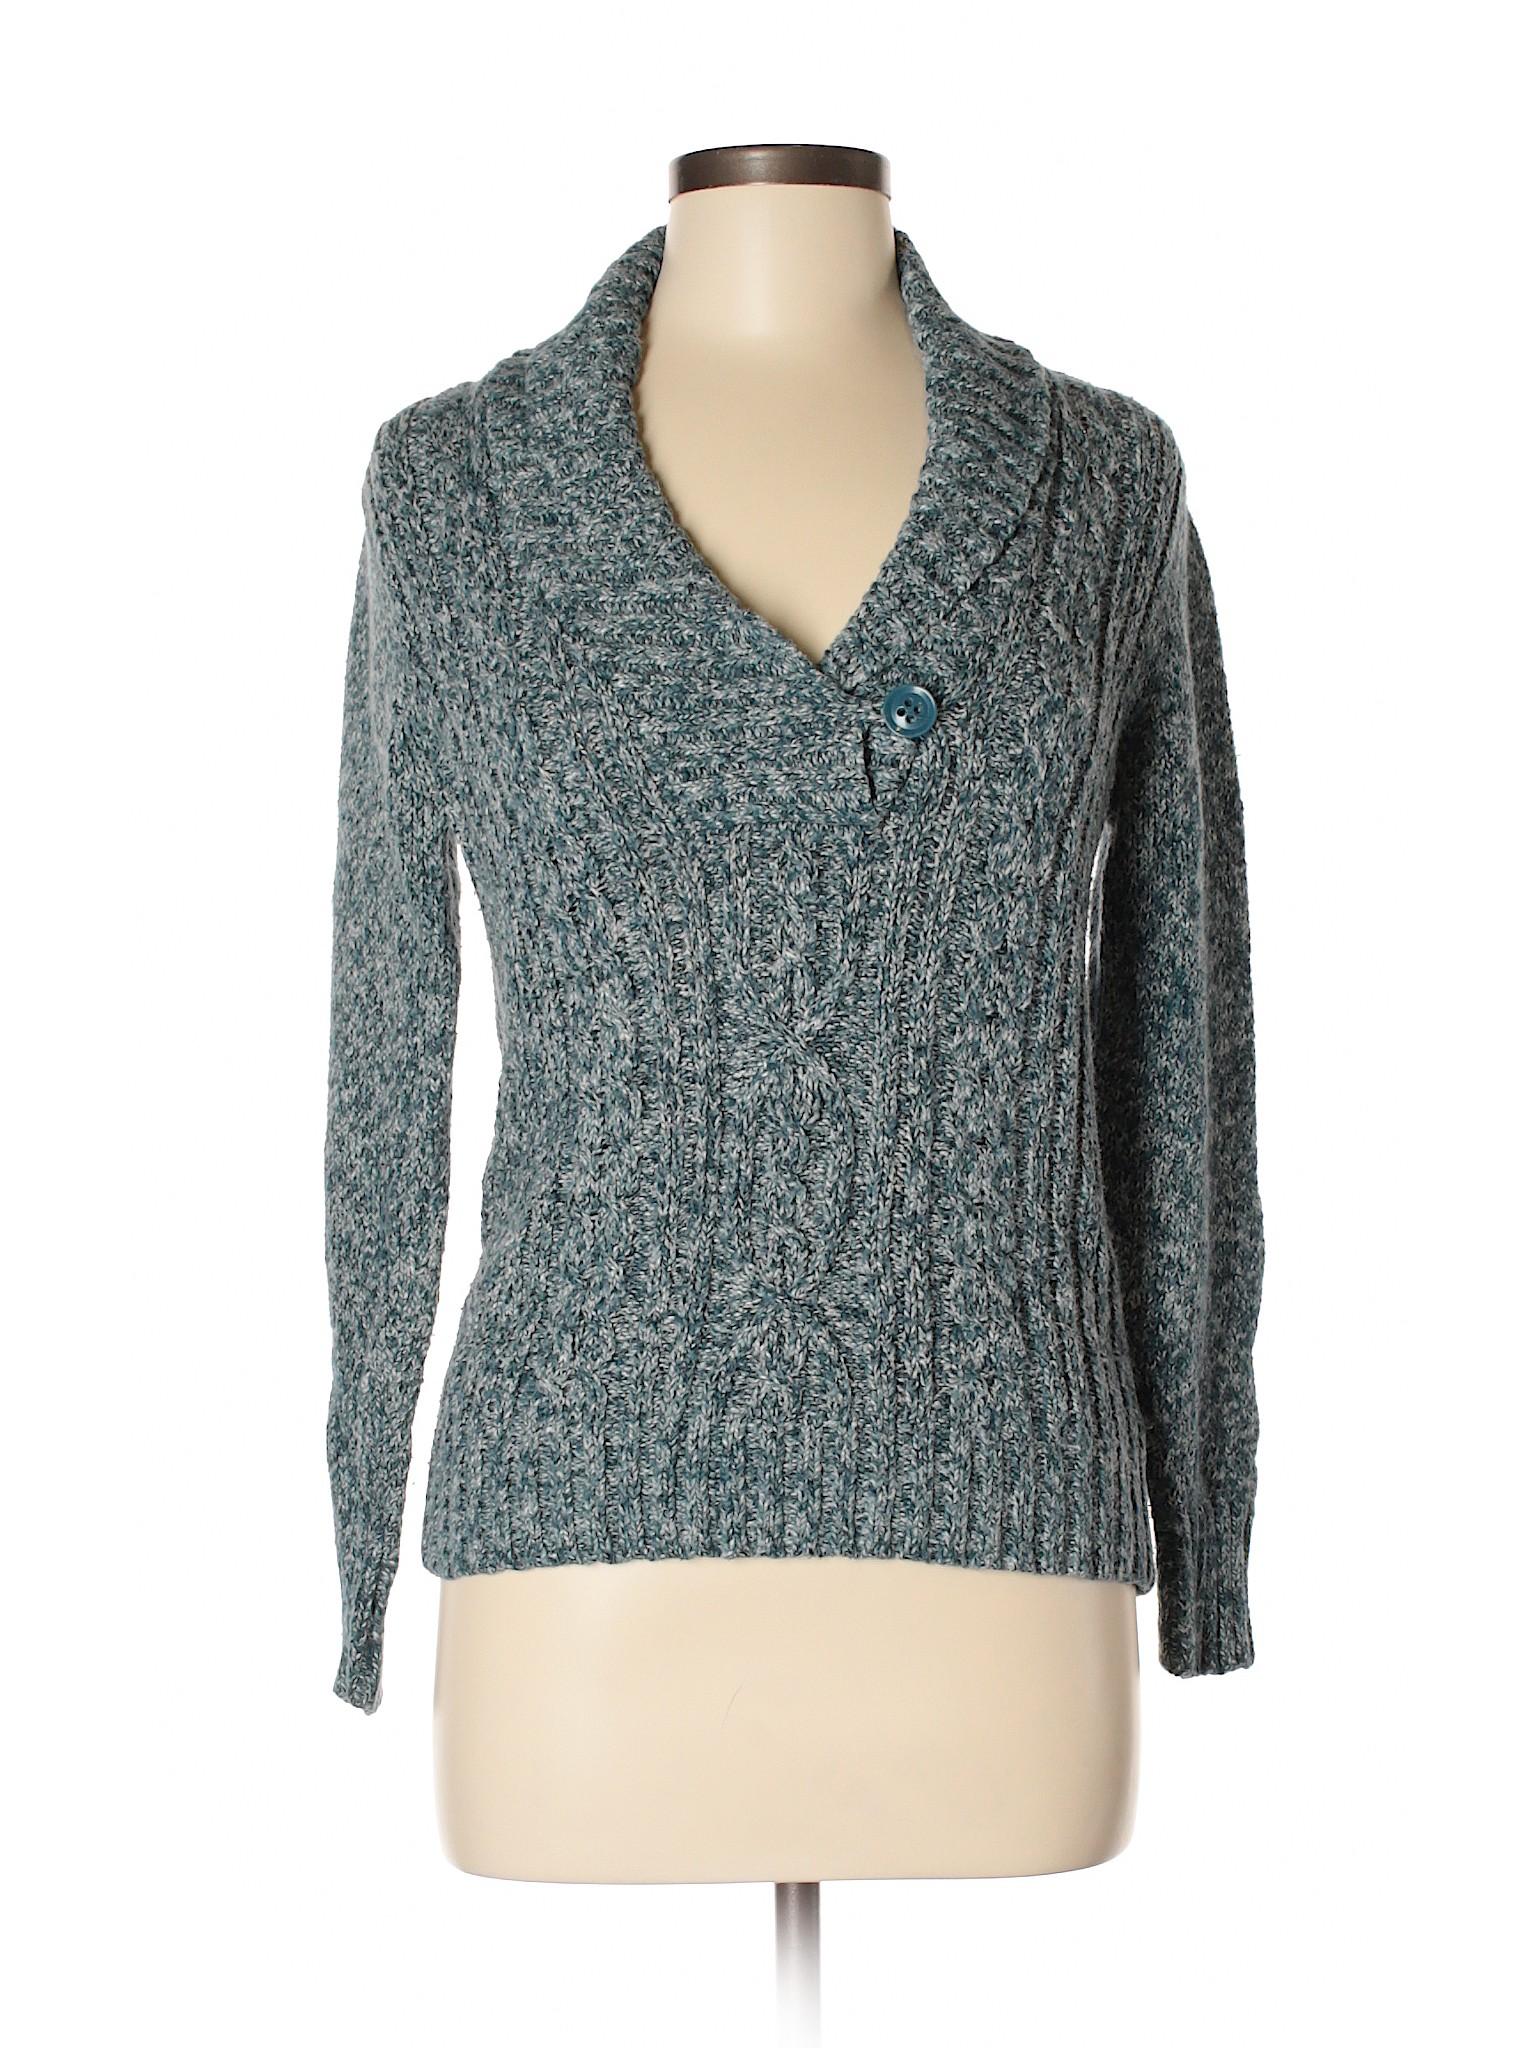 Sweater winter SONOMA Pullover style life Boutique fgqCCX